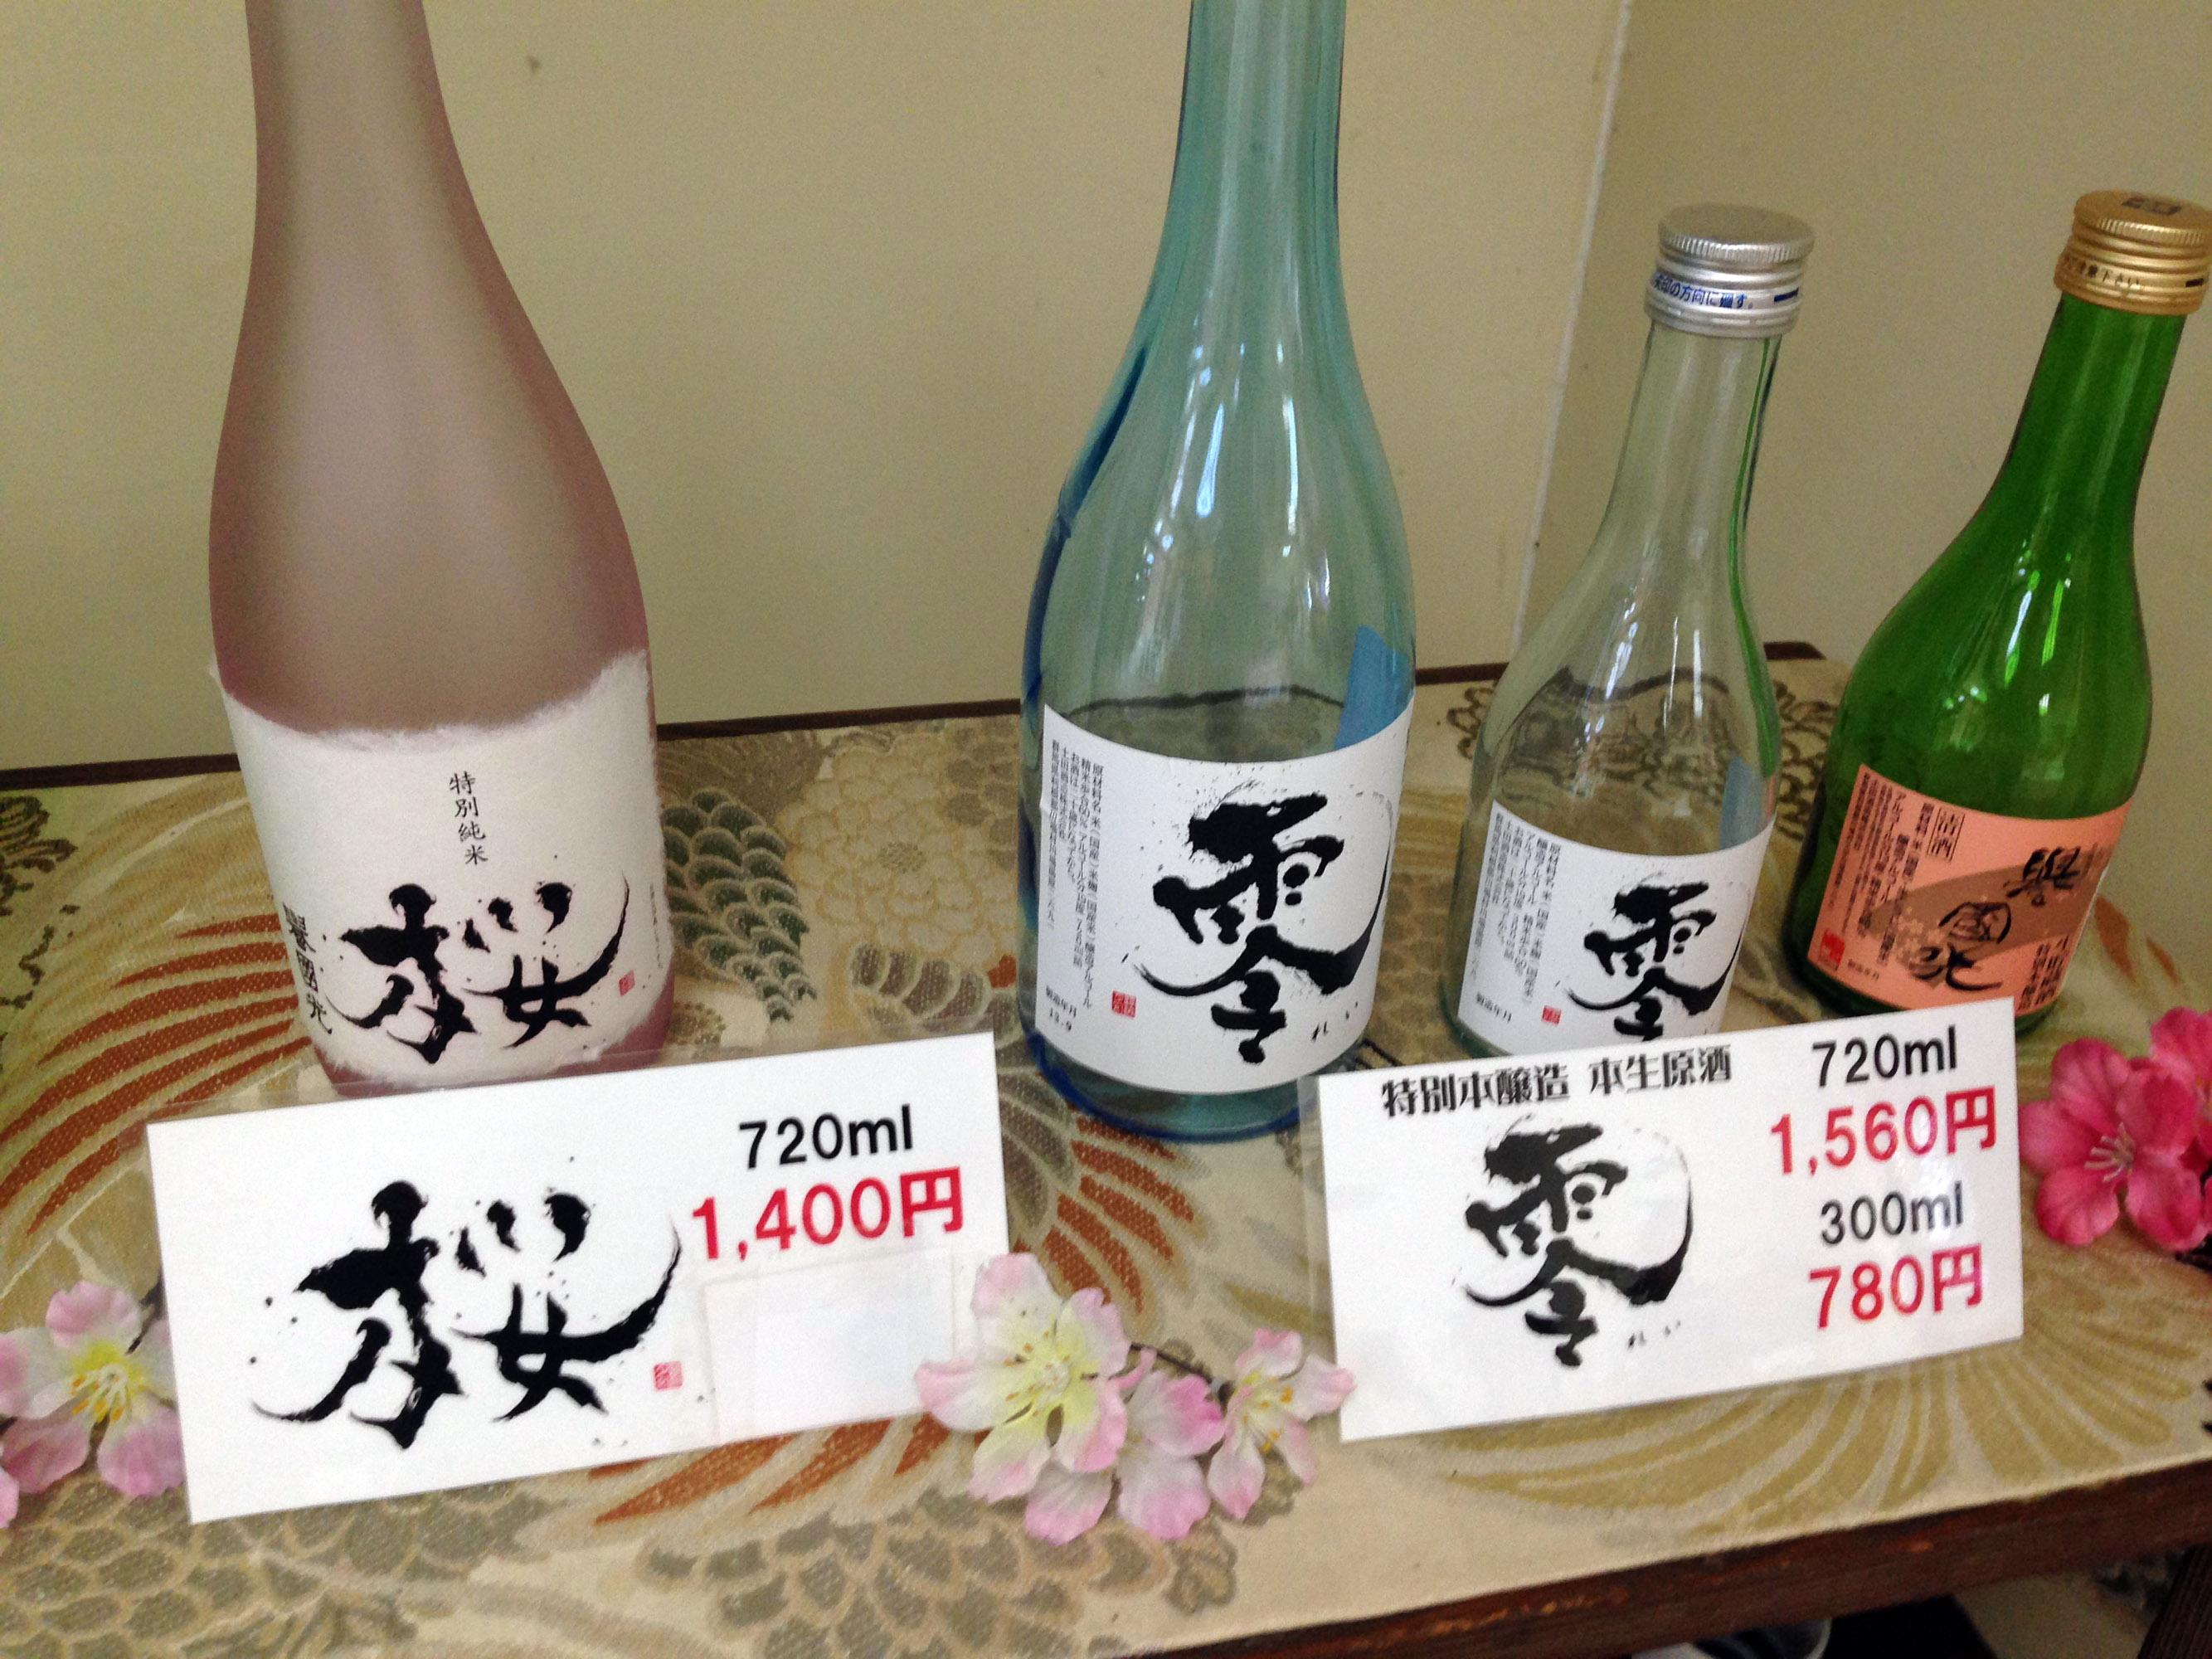 譽國光・土田酒造 酒蔵の直売所にて 遠藤夕幻書 「零」&「桜」